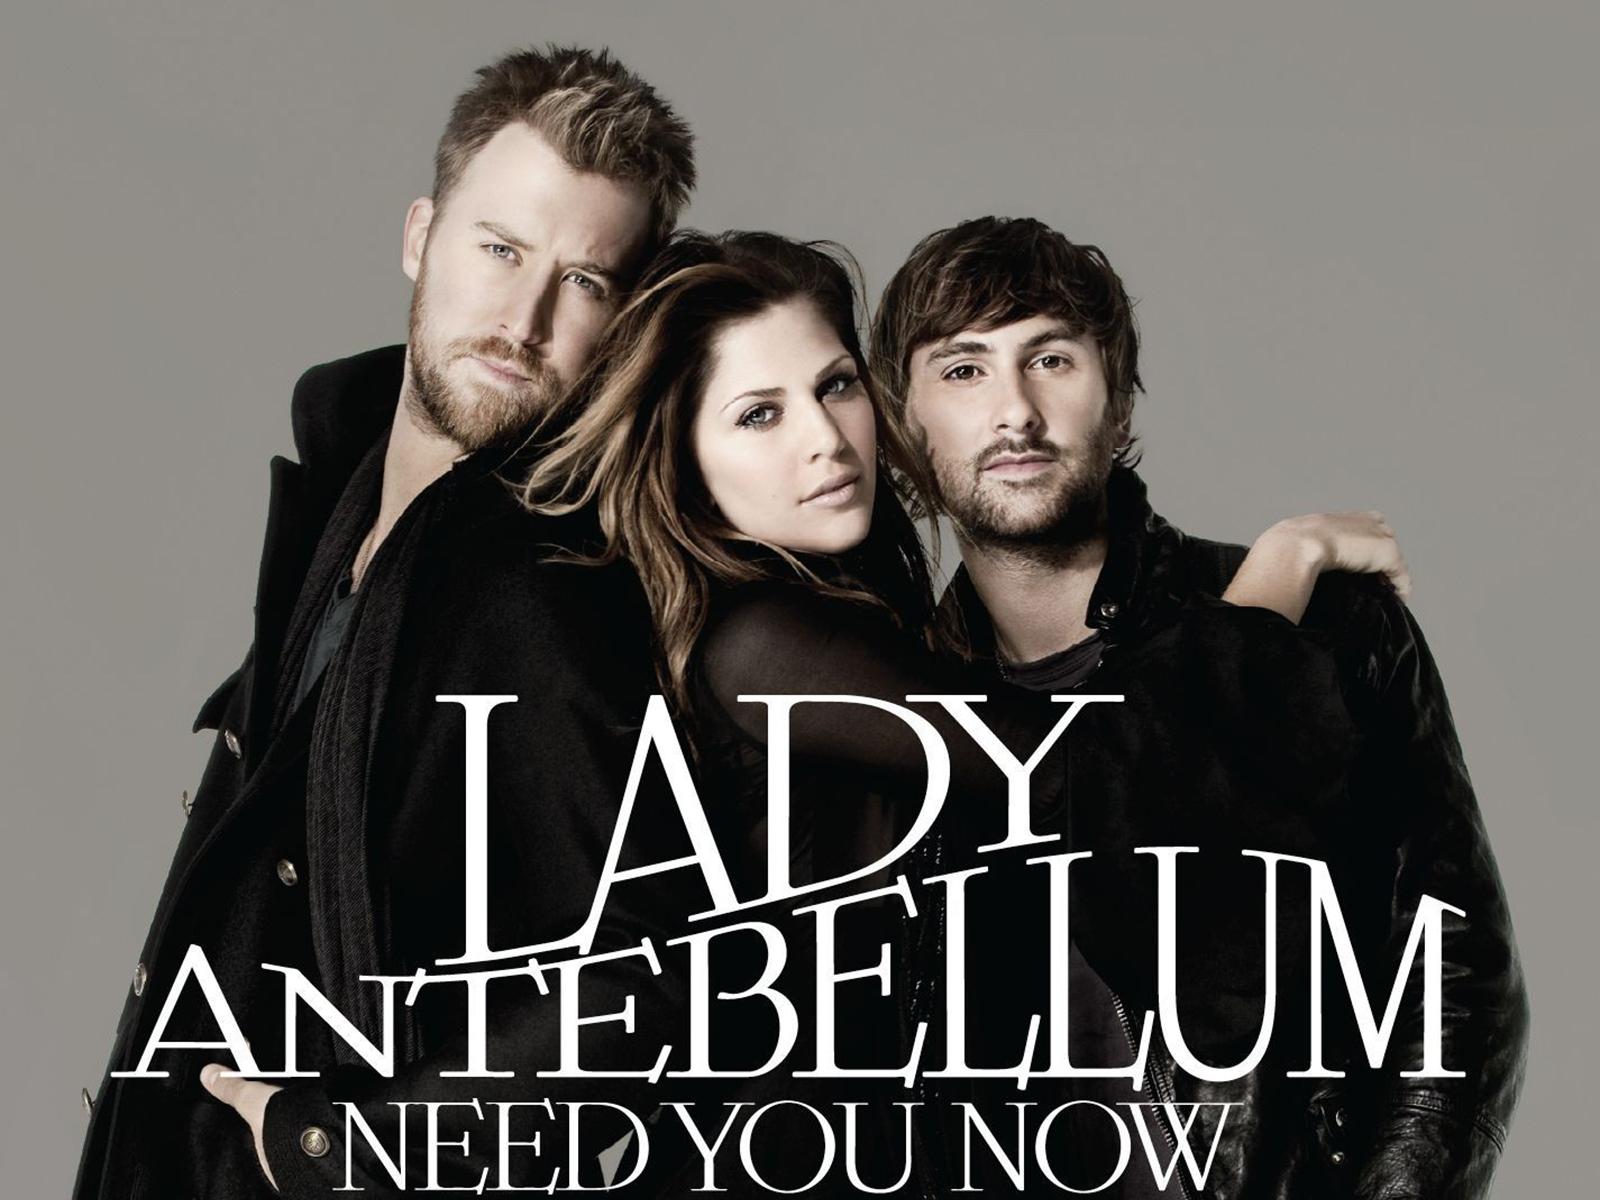 lady-antebellum-lady-antebellum-31261627-1600-1200